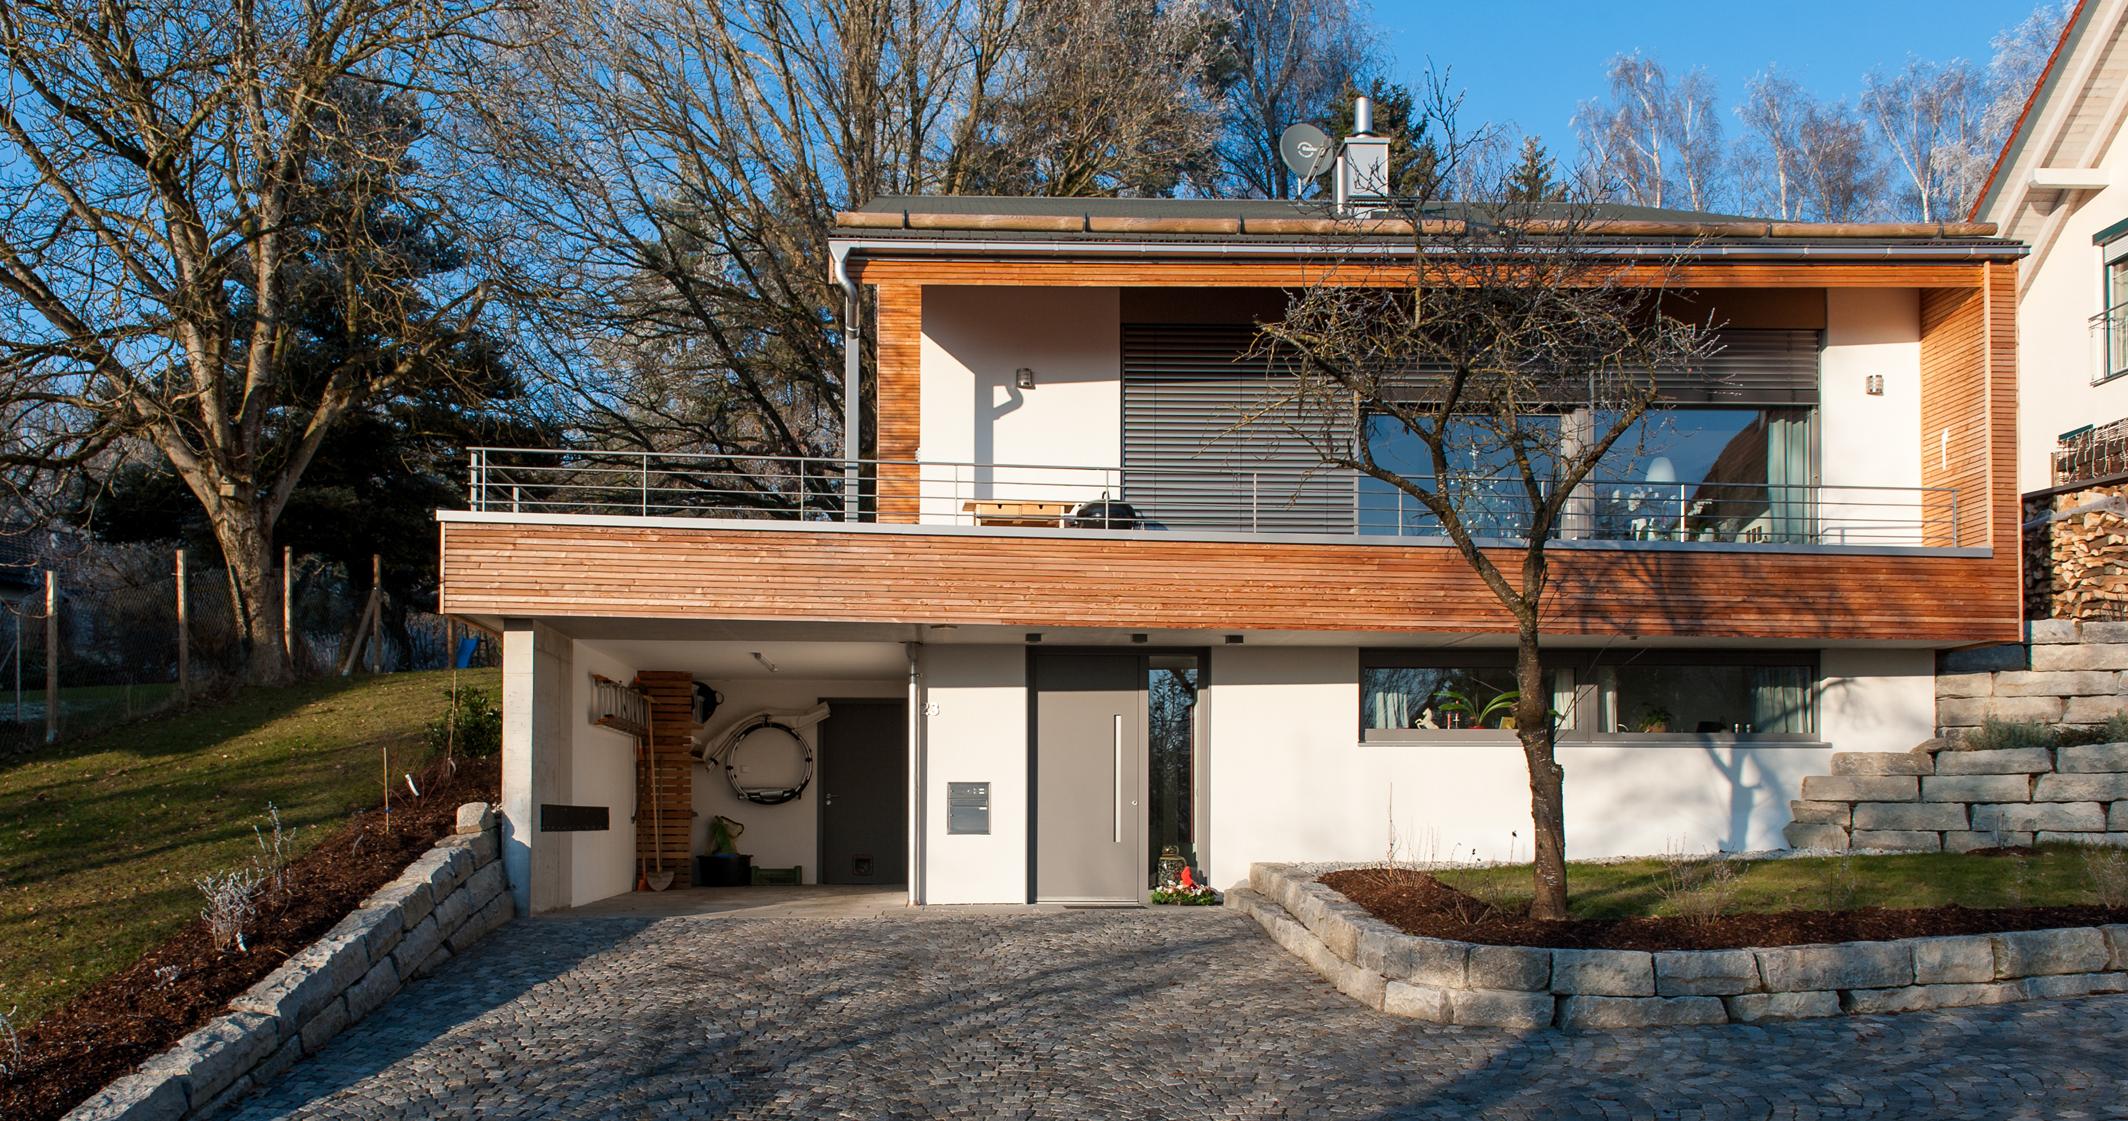 anger groh architekten einfamilienhaus in hohenpolding. Black Bedroom Furniture Sets. Home Design Ideas